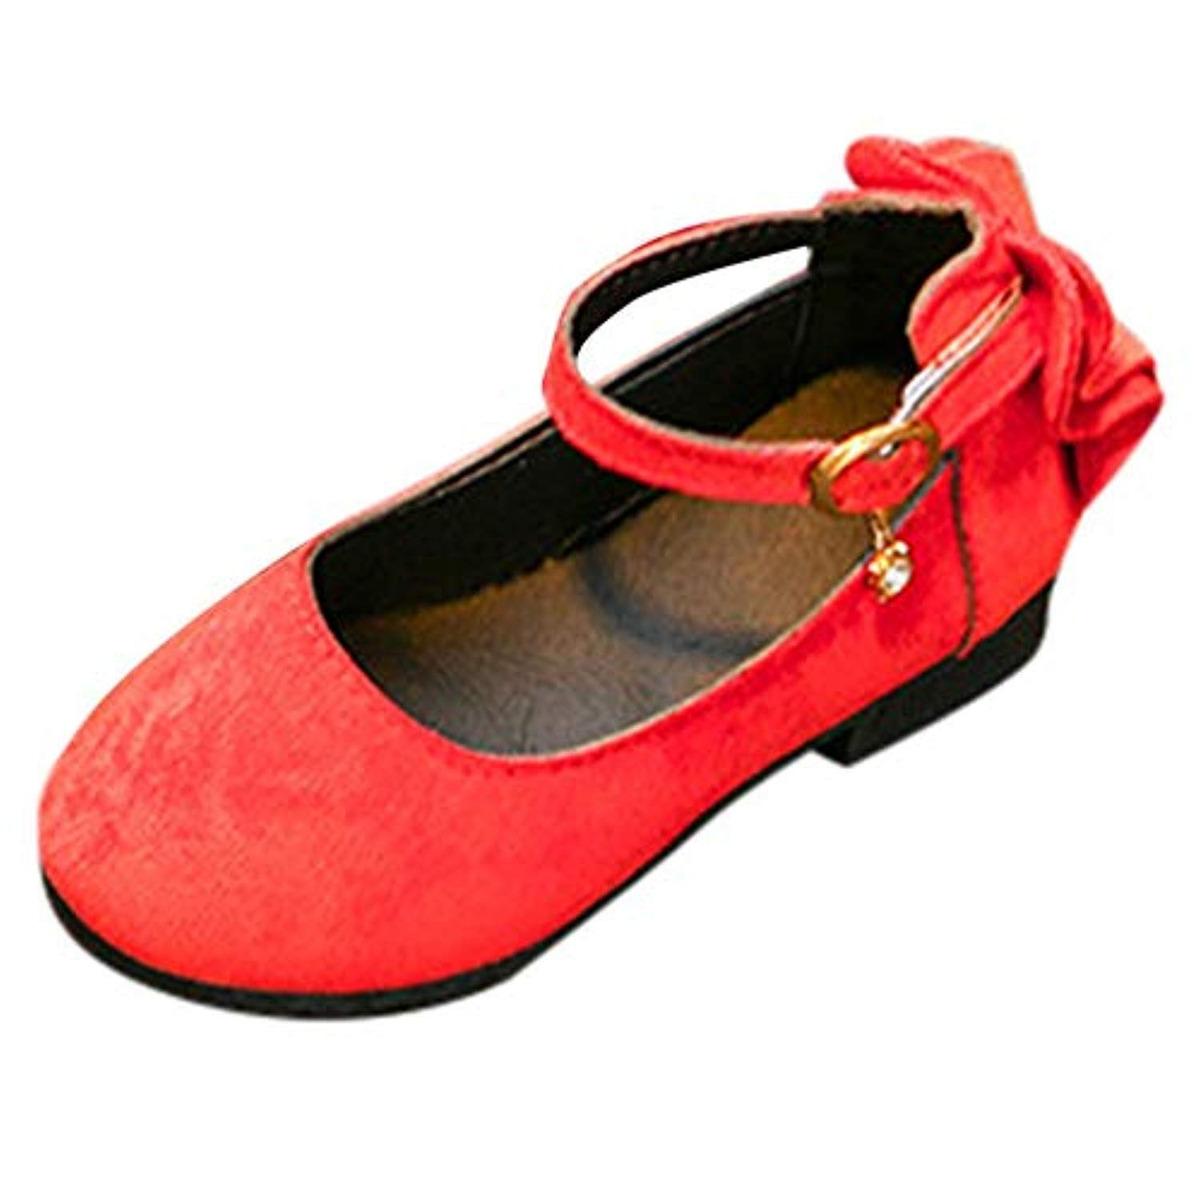 16f27bb9 Zapatos Para Correr Nativos Niños Pequeños - $ 108.533 en Mercado Libre